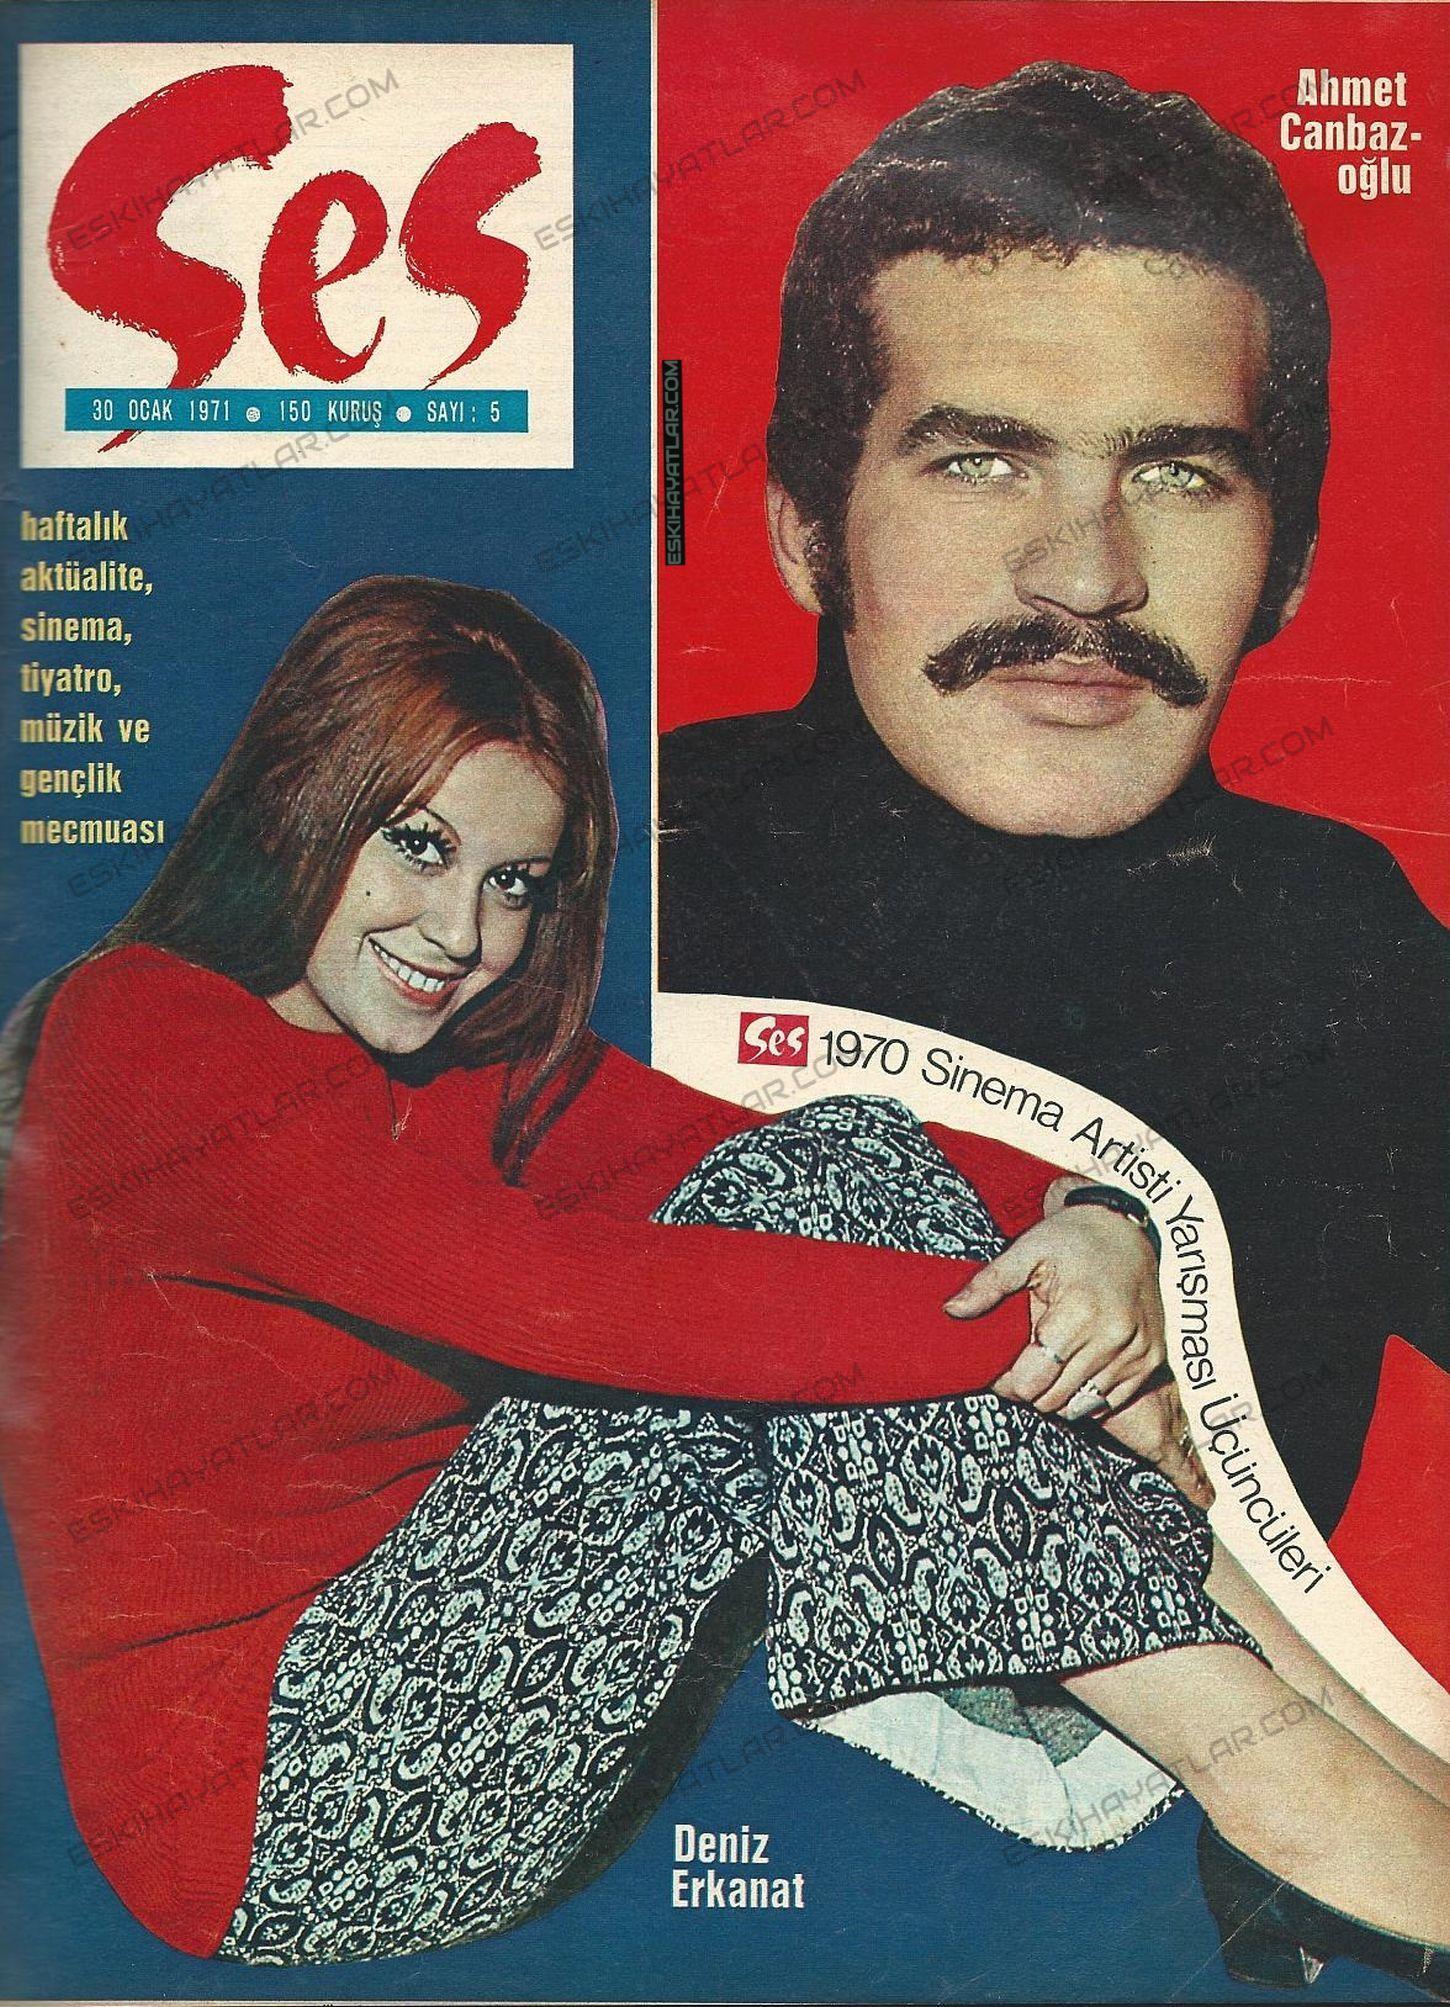 ses-dergisi-1971-sinema-artisti-yarismasi-deniz-erkanat-ahmet-canbazoglu (5)